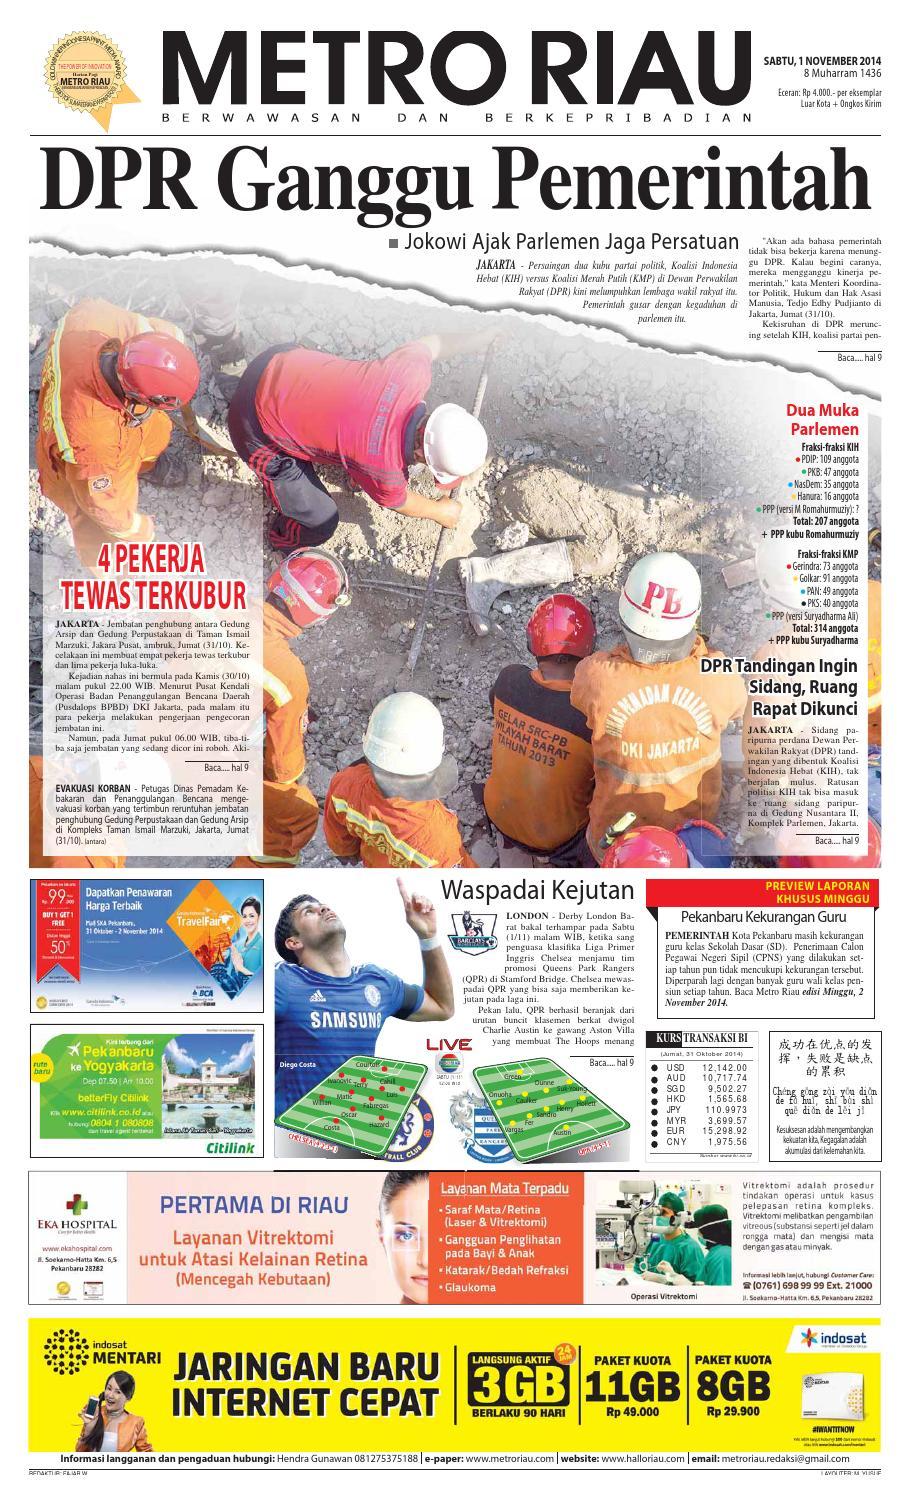 01112014 By Harian Pagi Metro Riau Issuu Sepatu Olahraga Lari Lokal  Fans Veloz N